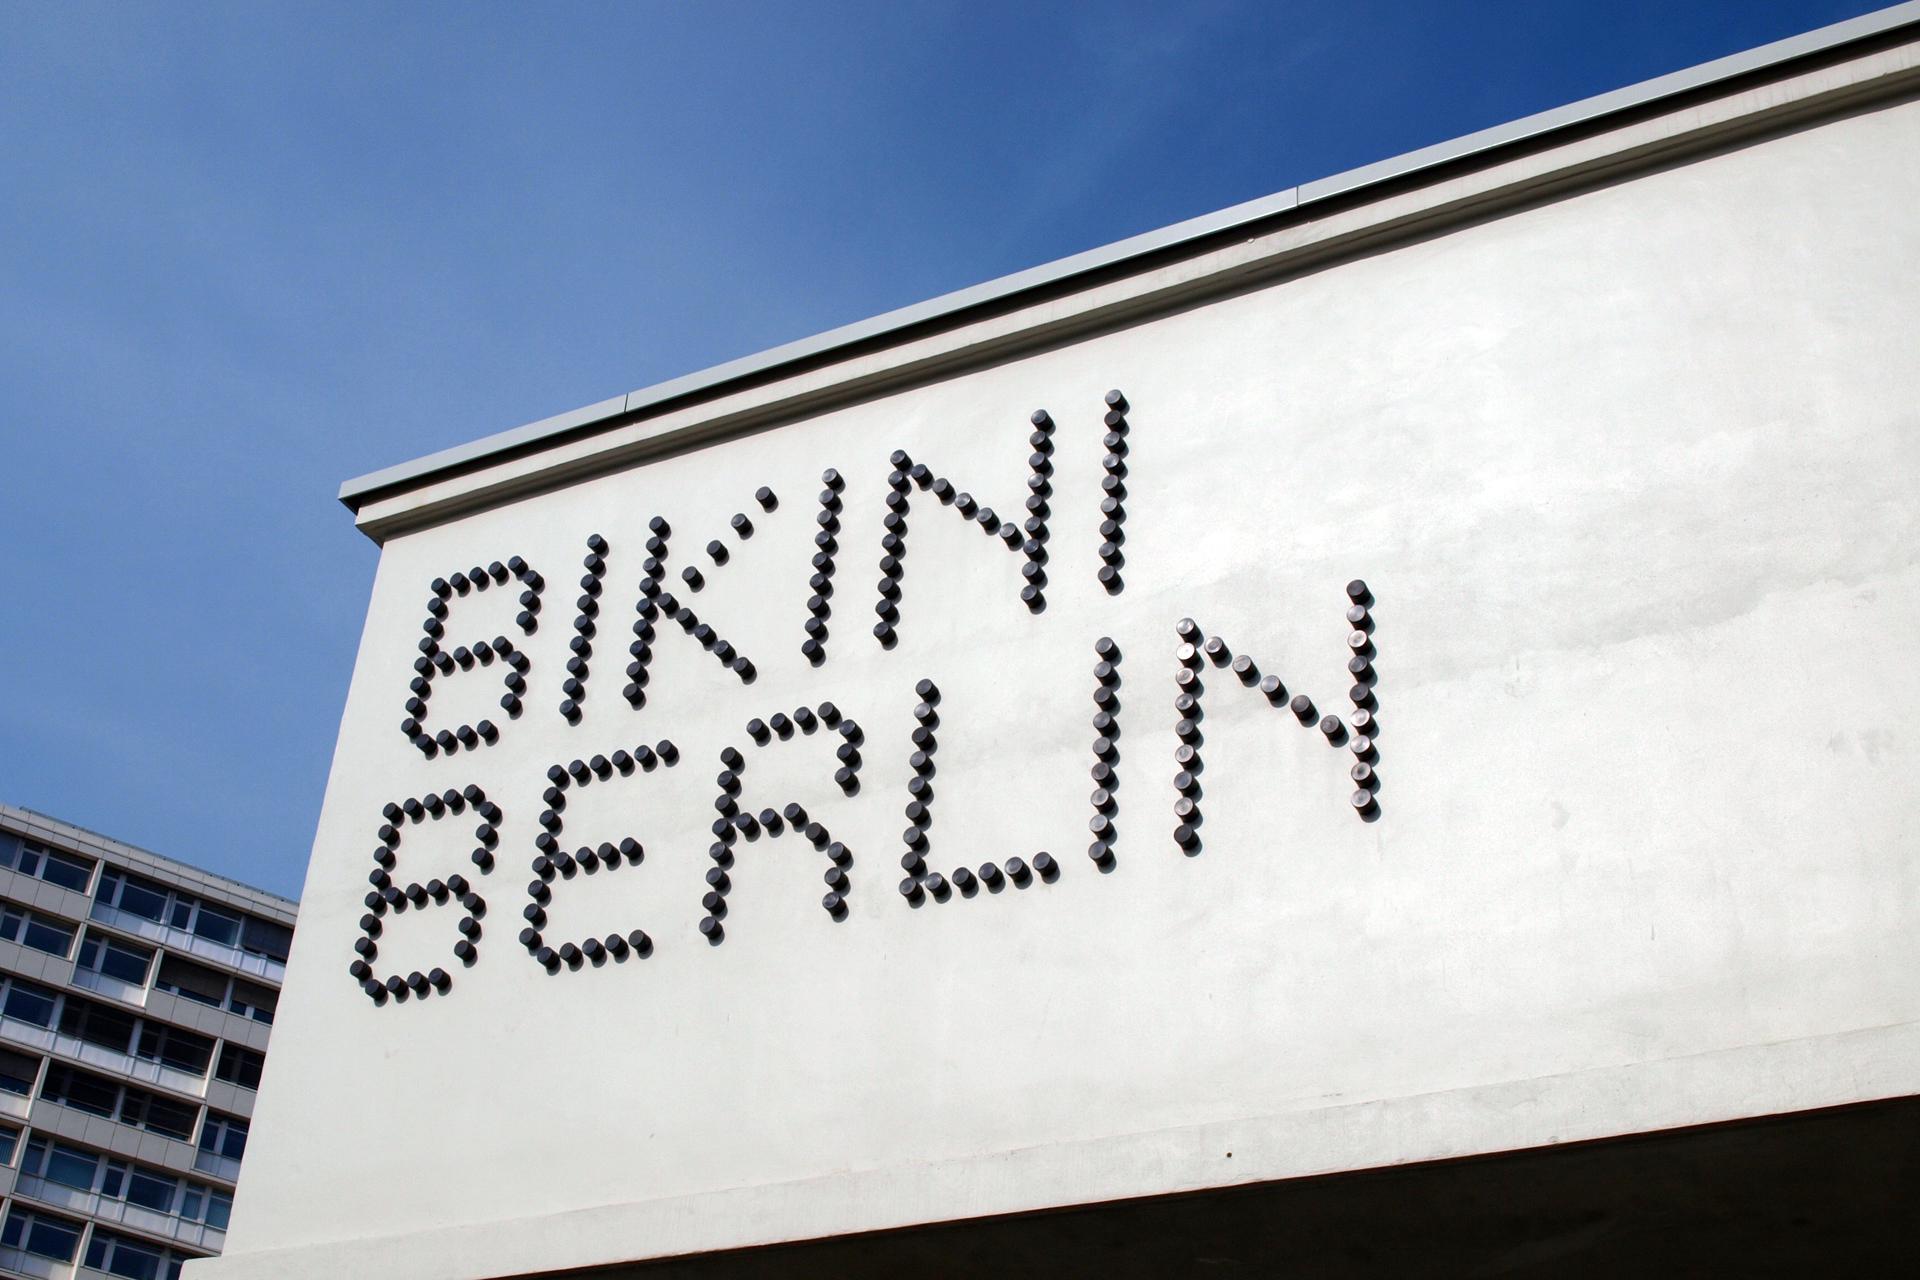 buchstabenplus, bikini, berlin